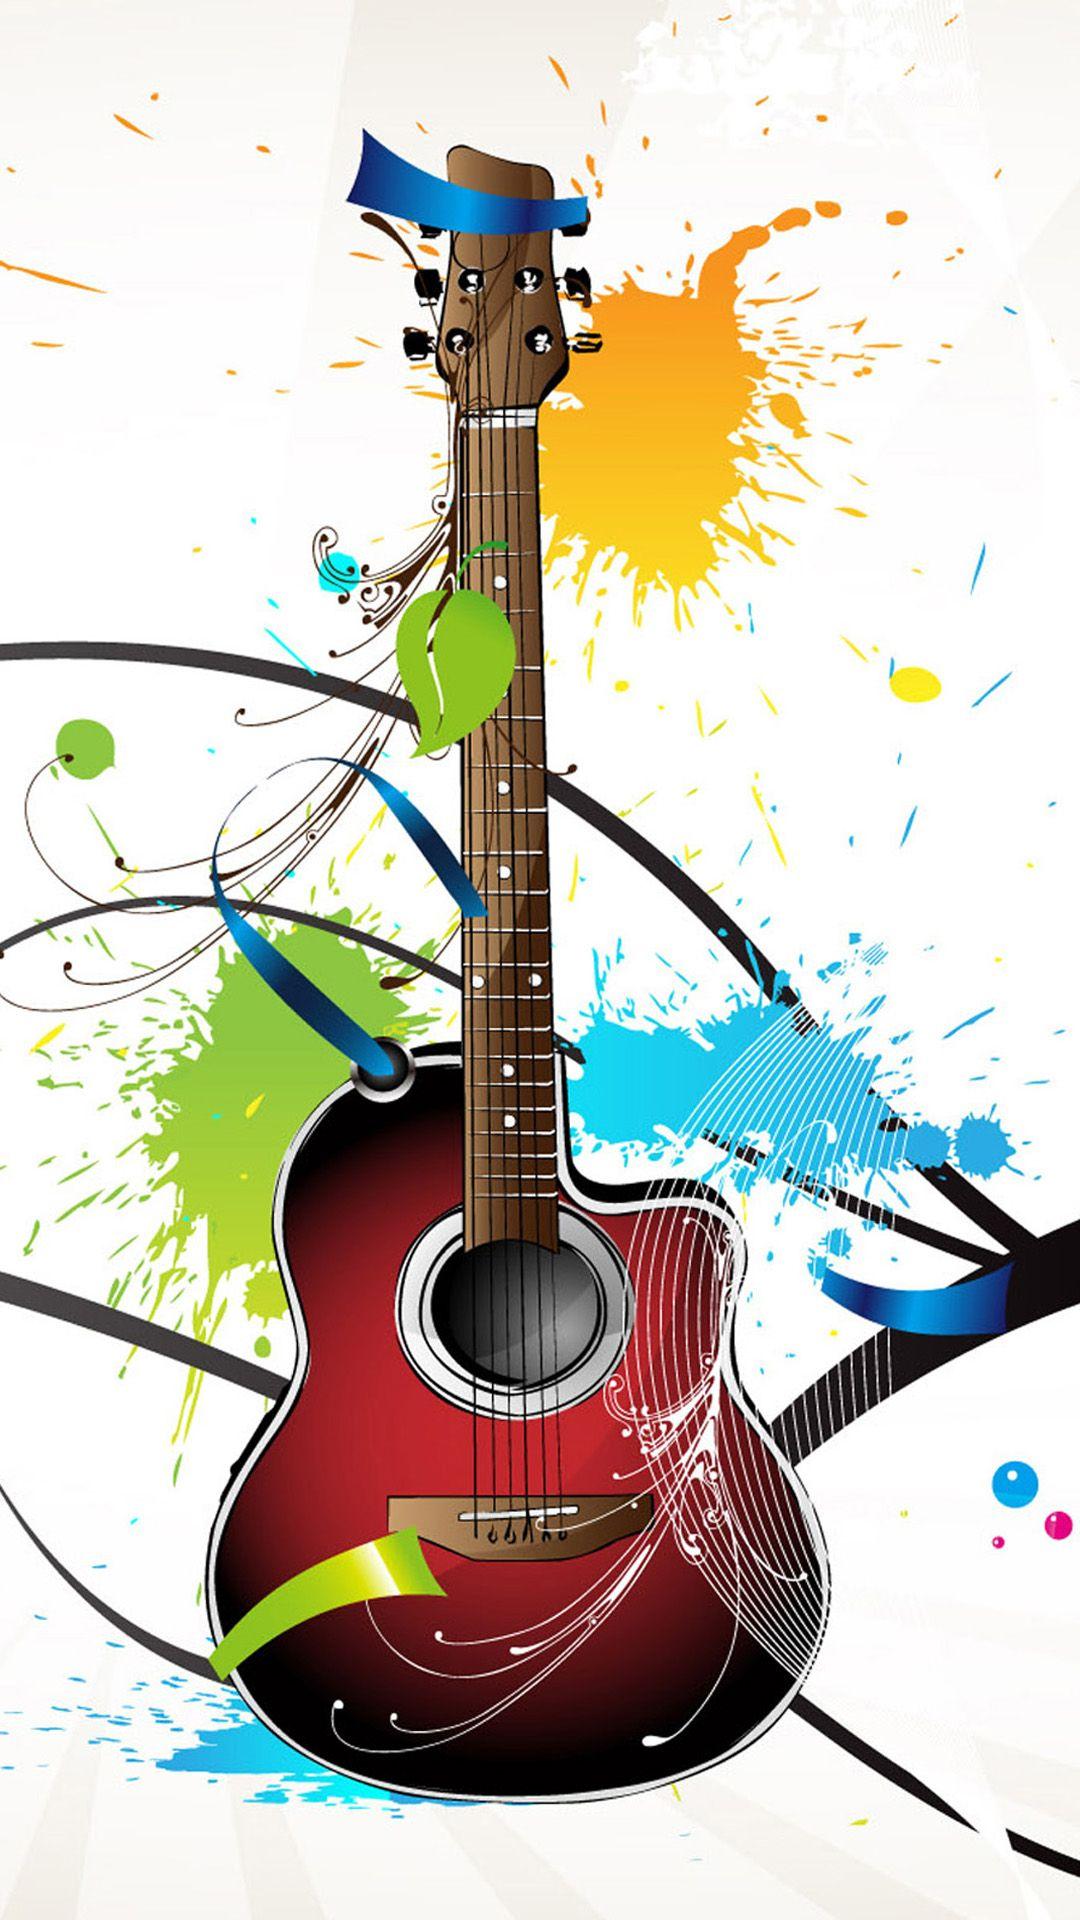 Popular Wallpaper Home Screen Guitar - 8bdfe70b3489d24da077d92b881387f1  Perfect Image Reference_173566.jpg